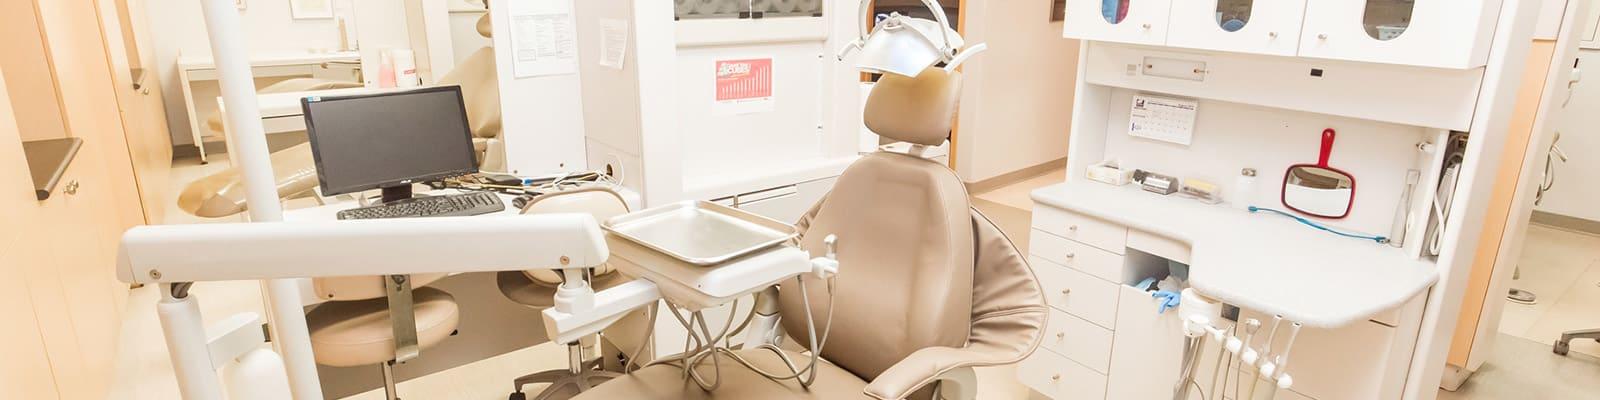 dental services in east kildonan transcona odyssey dental care